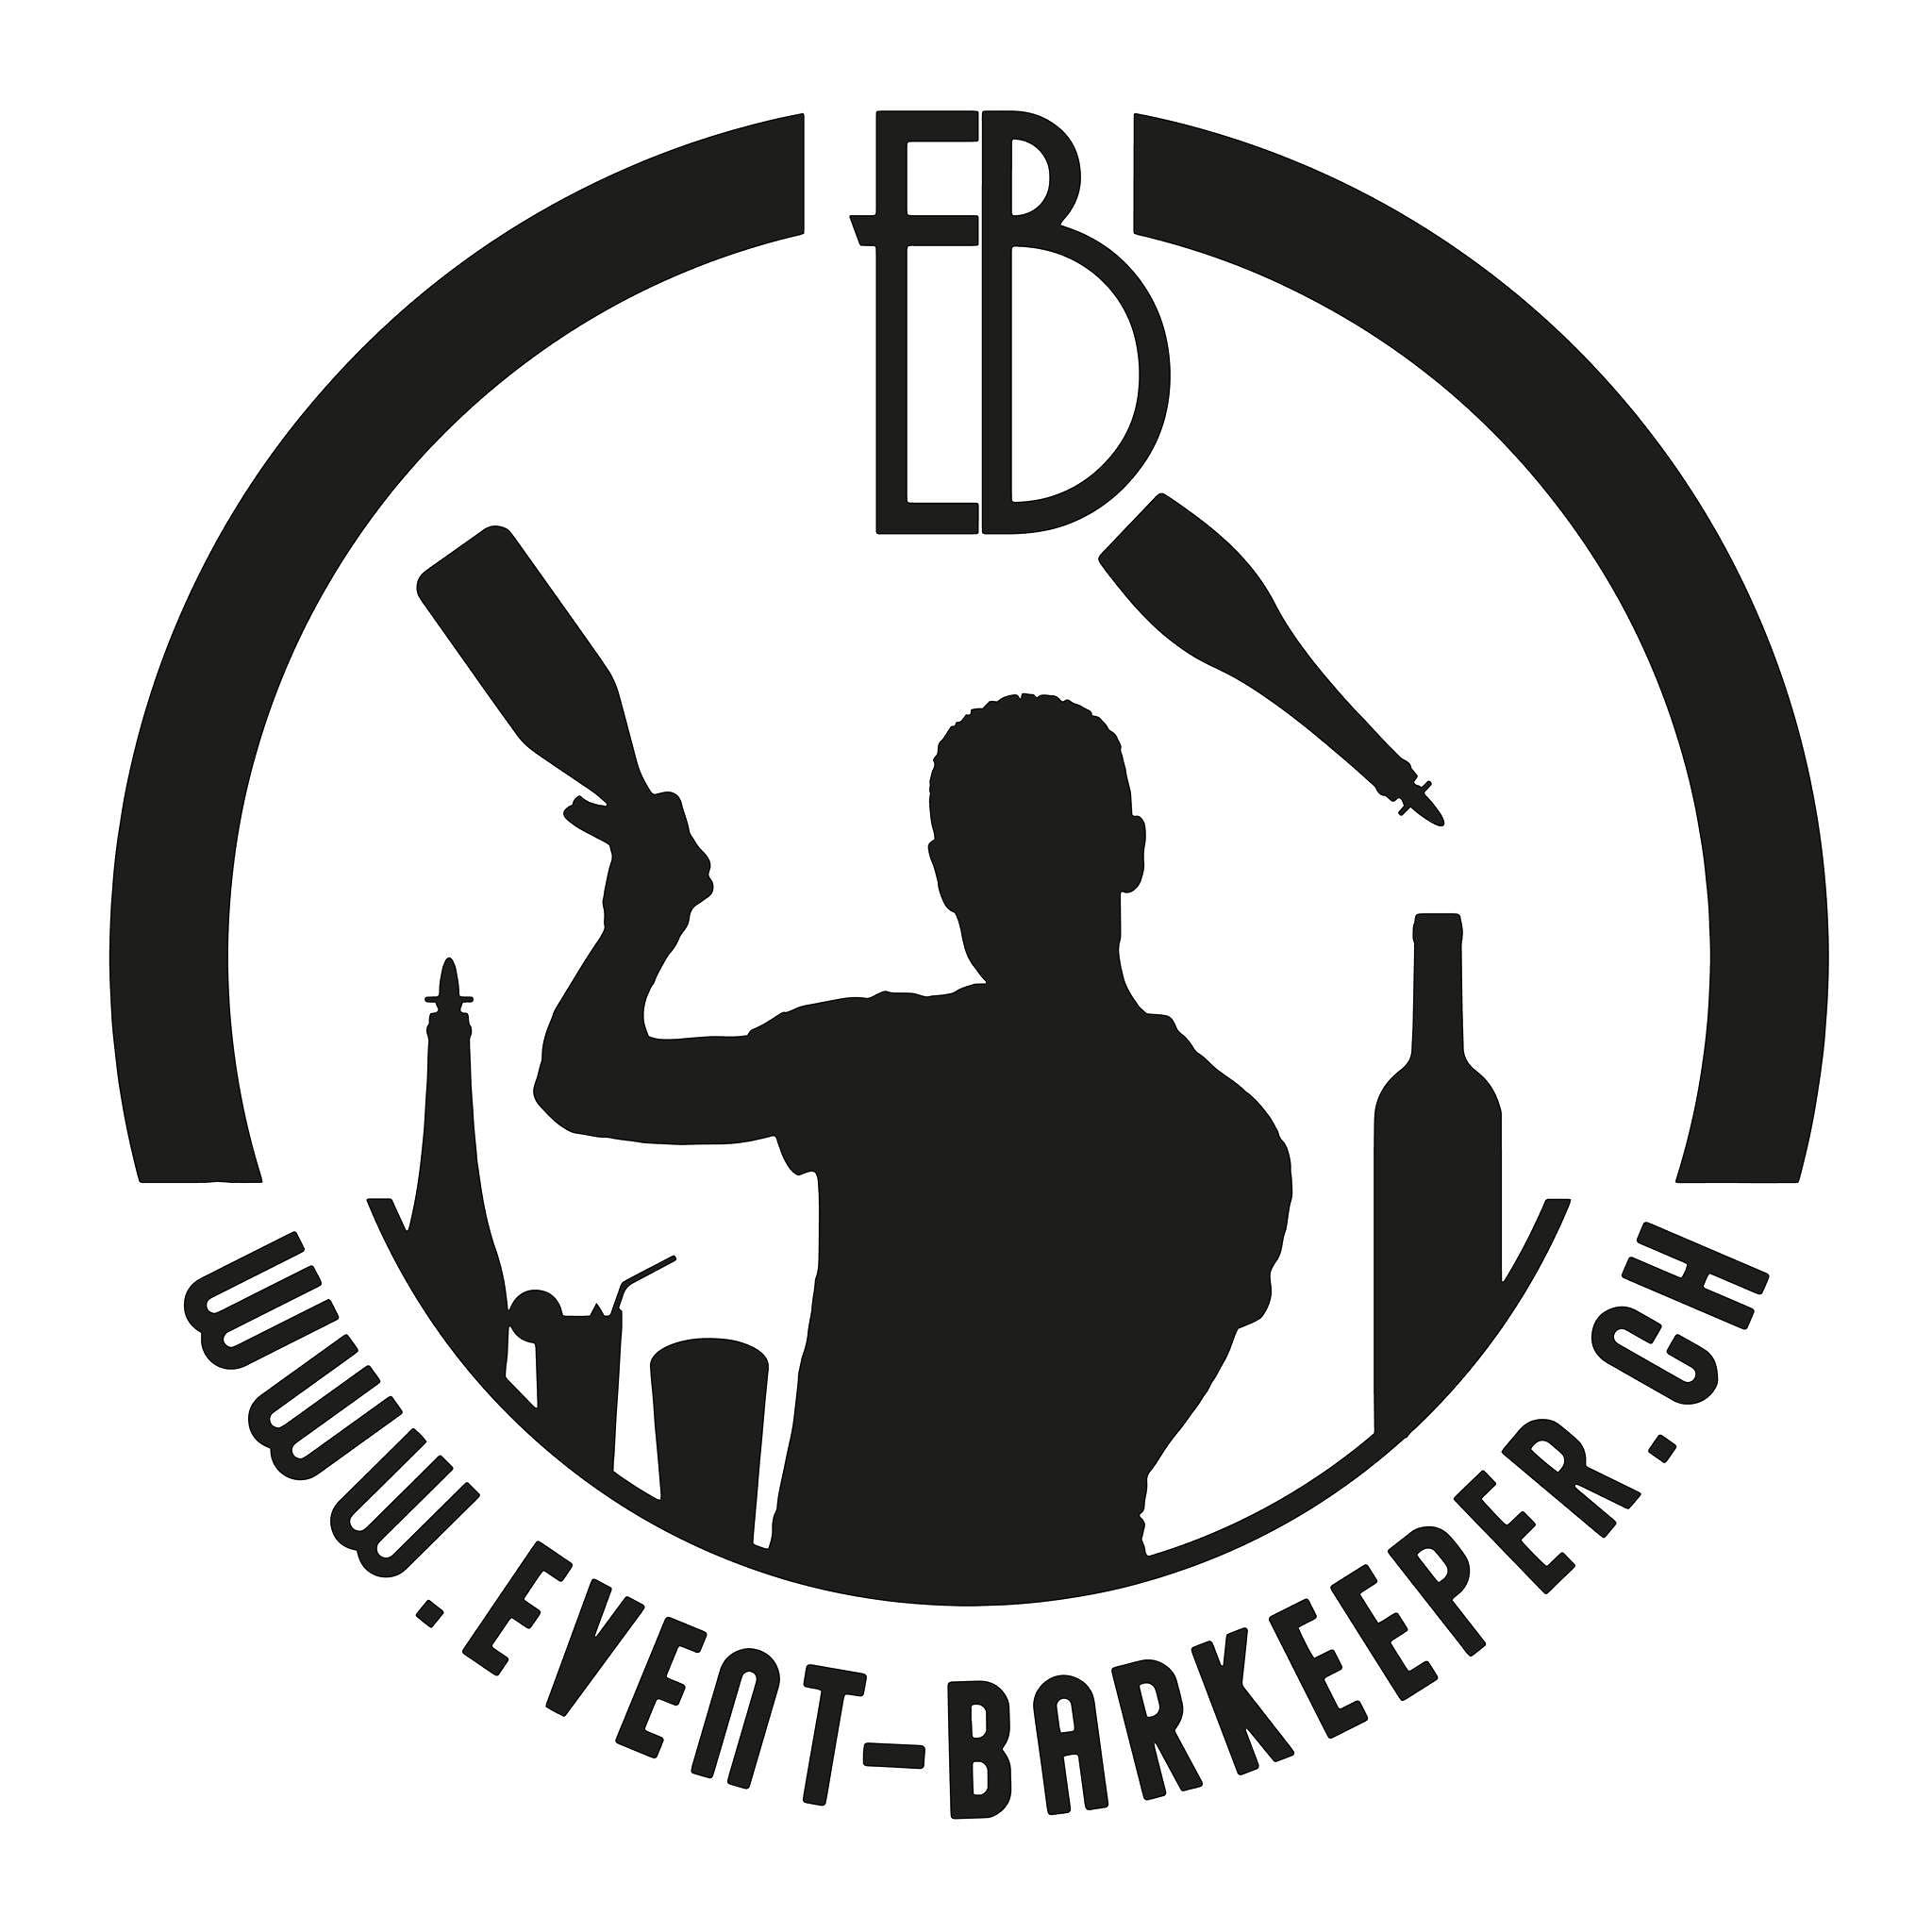 Event-Barkeeper.ch Paulus